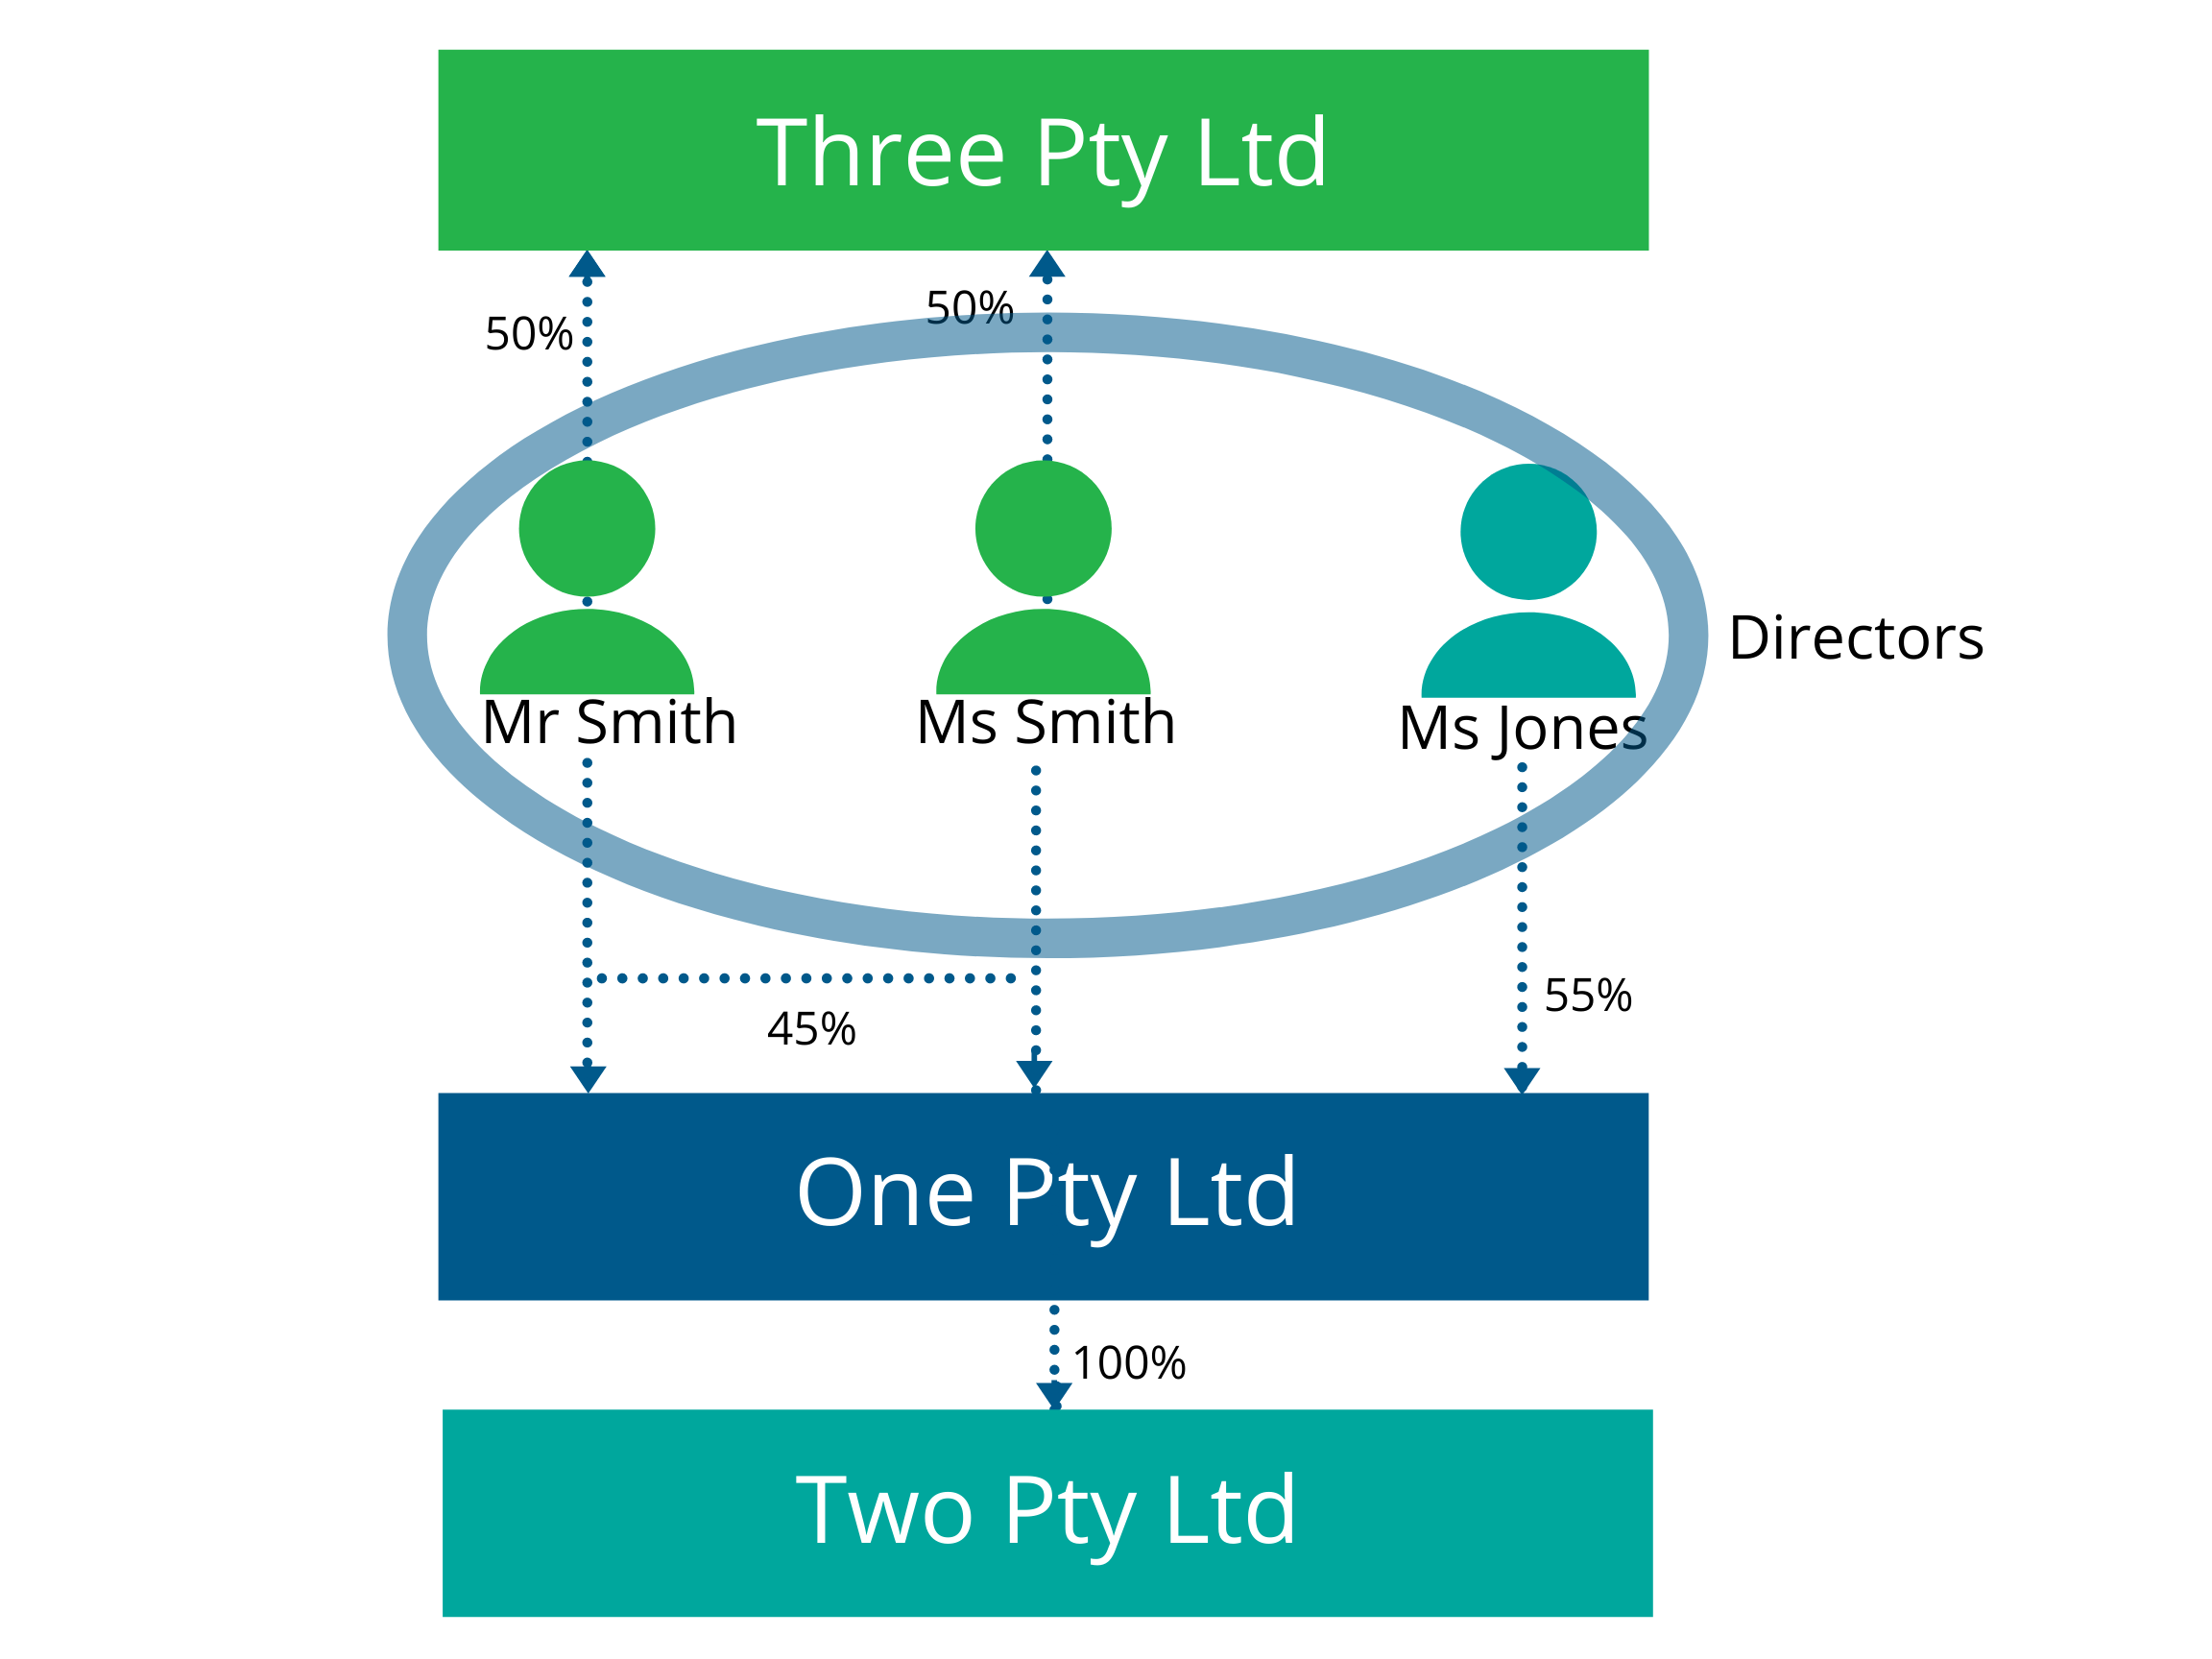 Illustration showing 3 directors of One Pty Ltd are 2 directors of 3 Pty Ltd and One Pty Ltd owns 100% of Two Pty Ltd